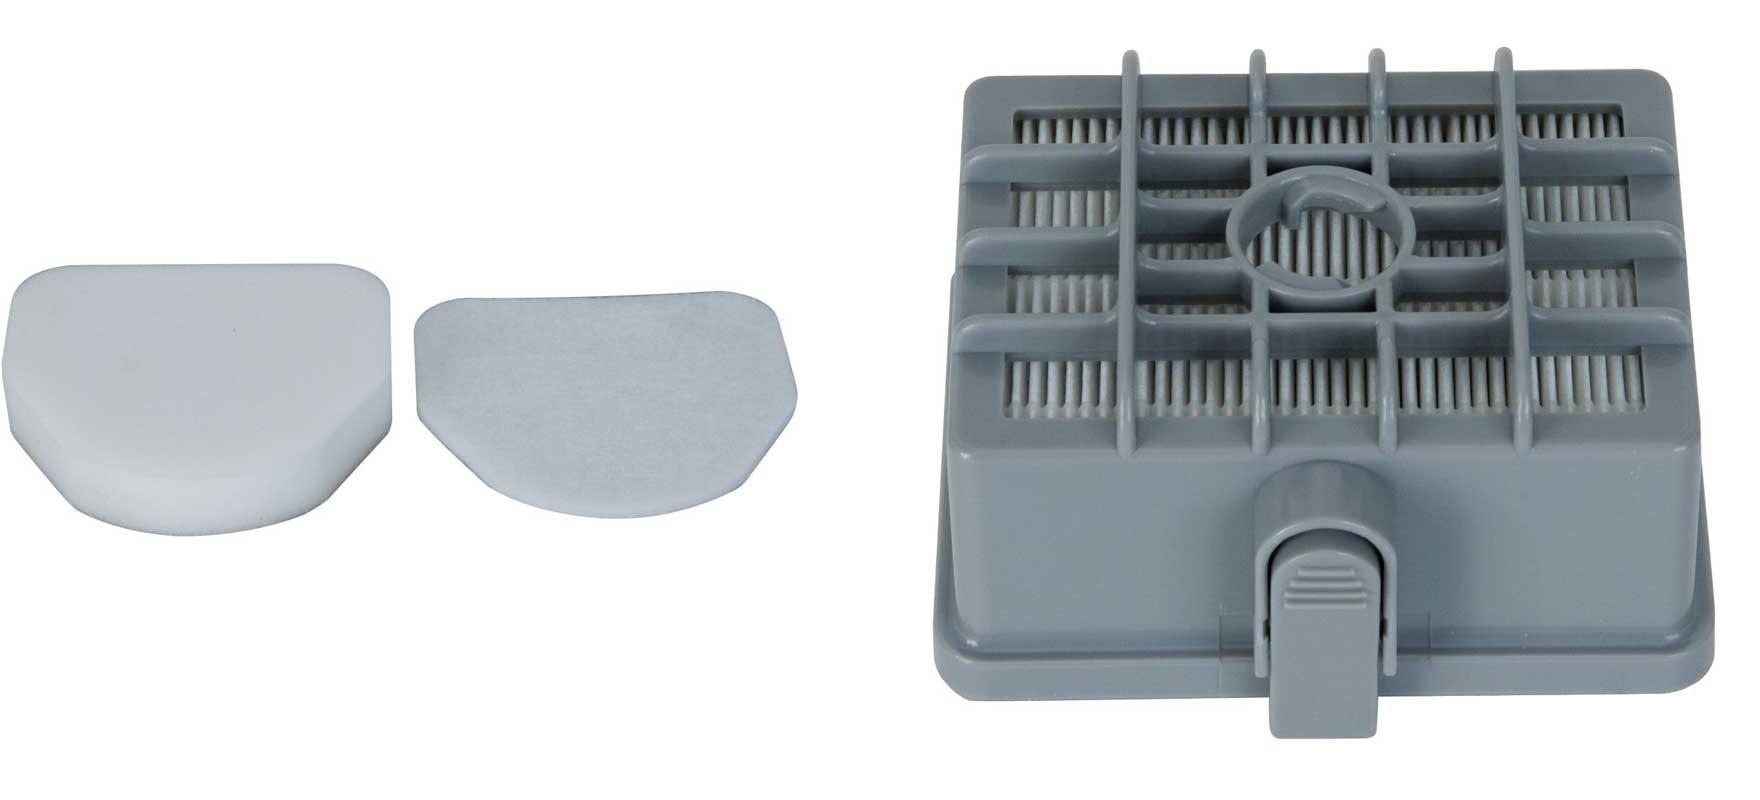 Shark Rotator Professional Filter Kit by Shark